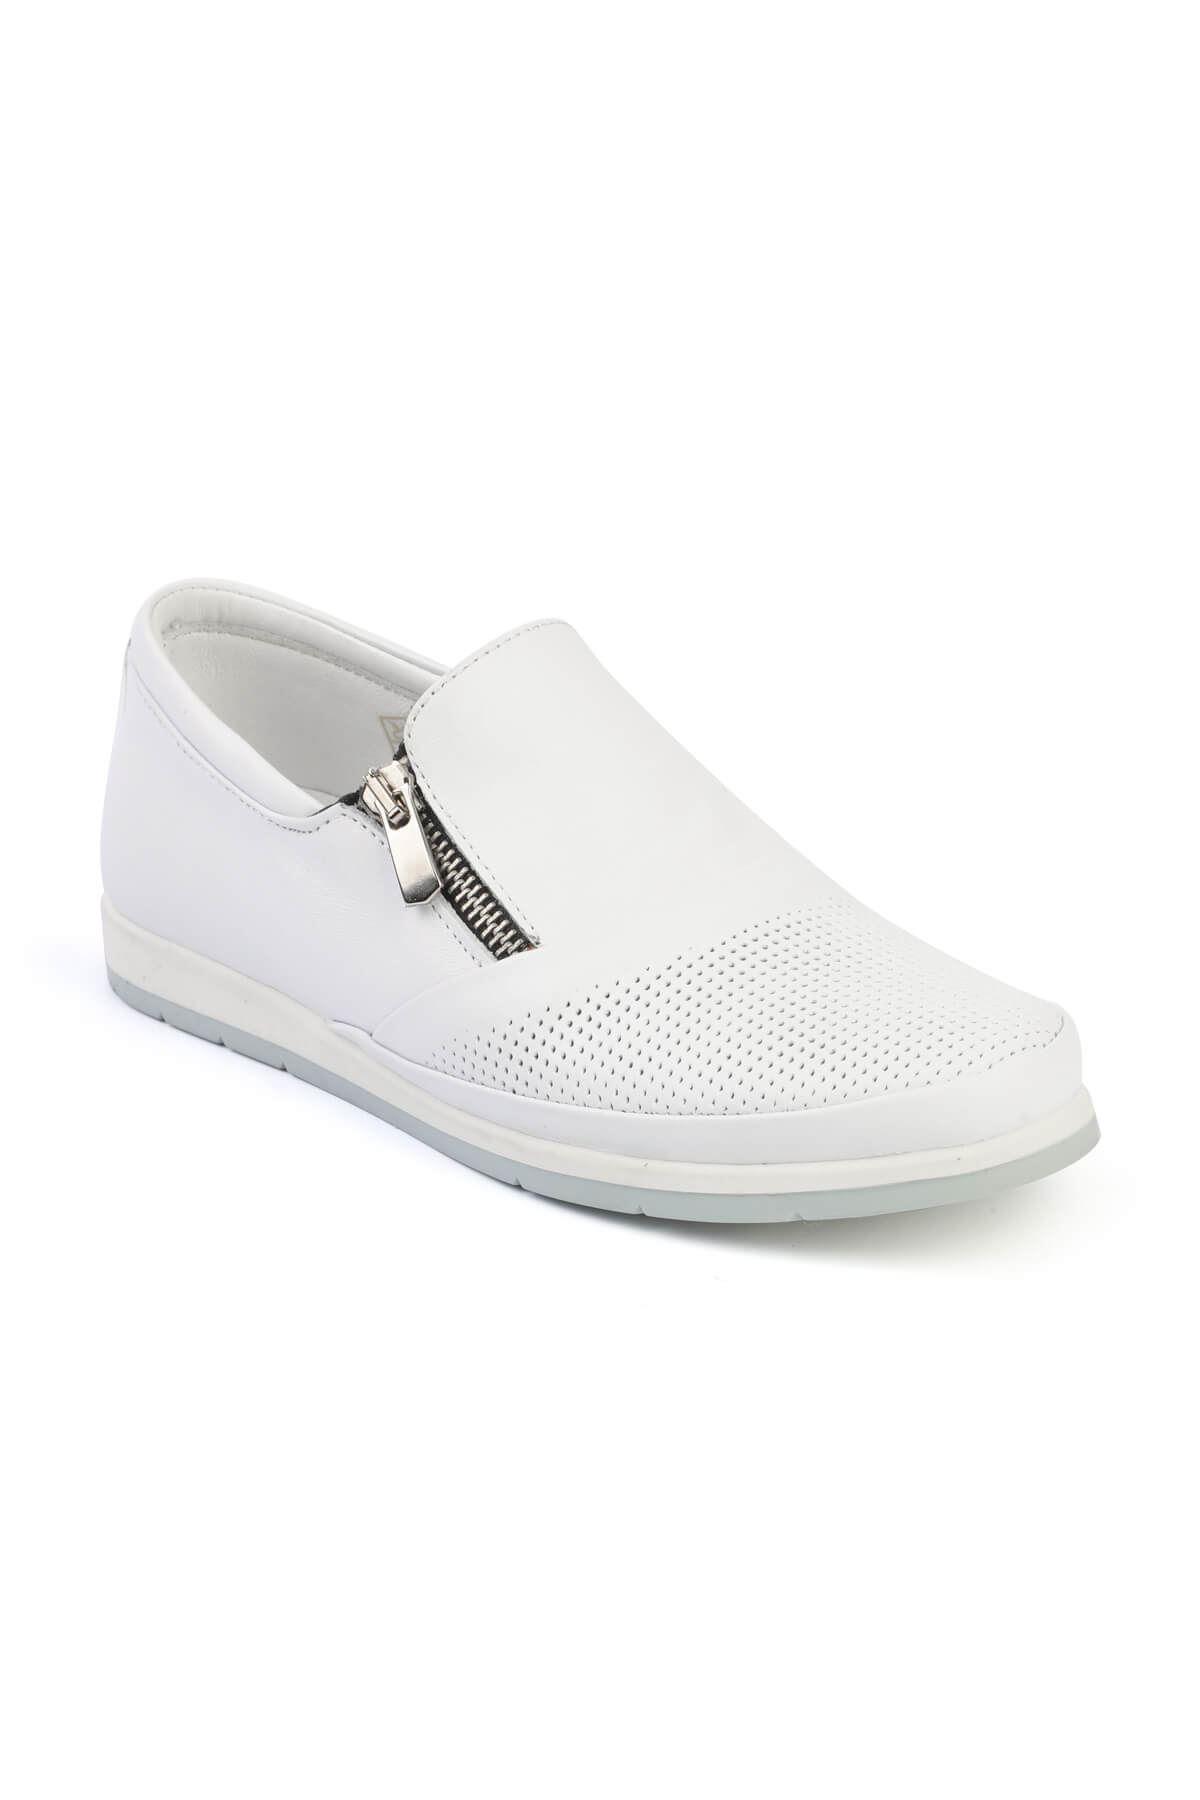 Libero FMS202 Beyaz Casual Ayakkabı